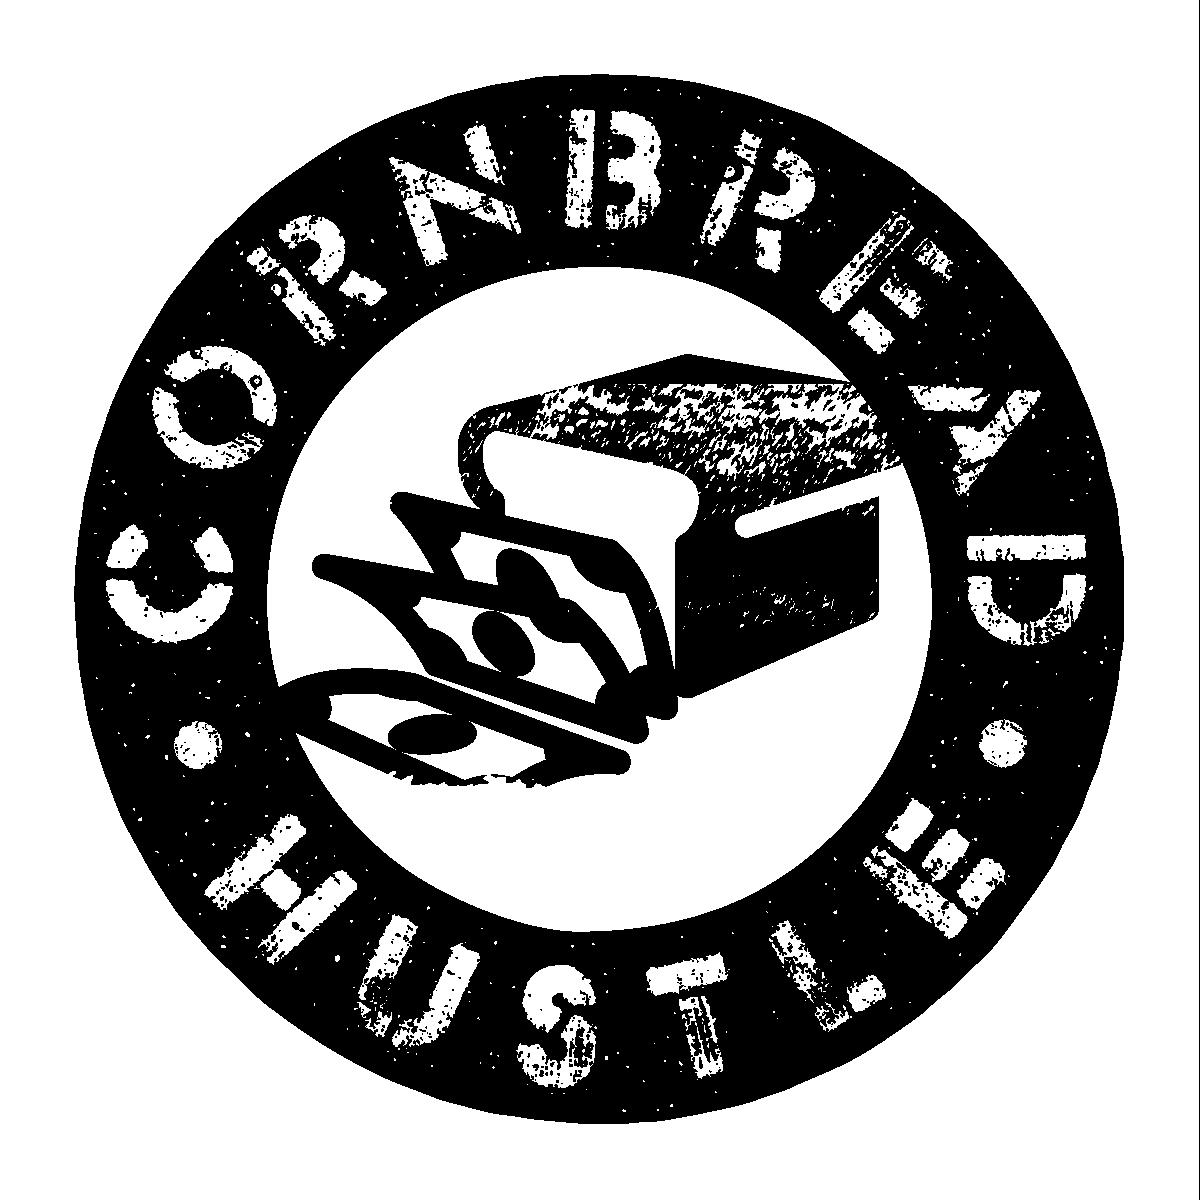 Cornbread Hustle logo